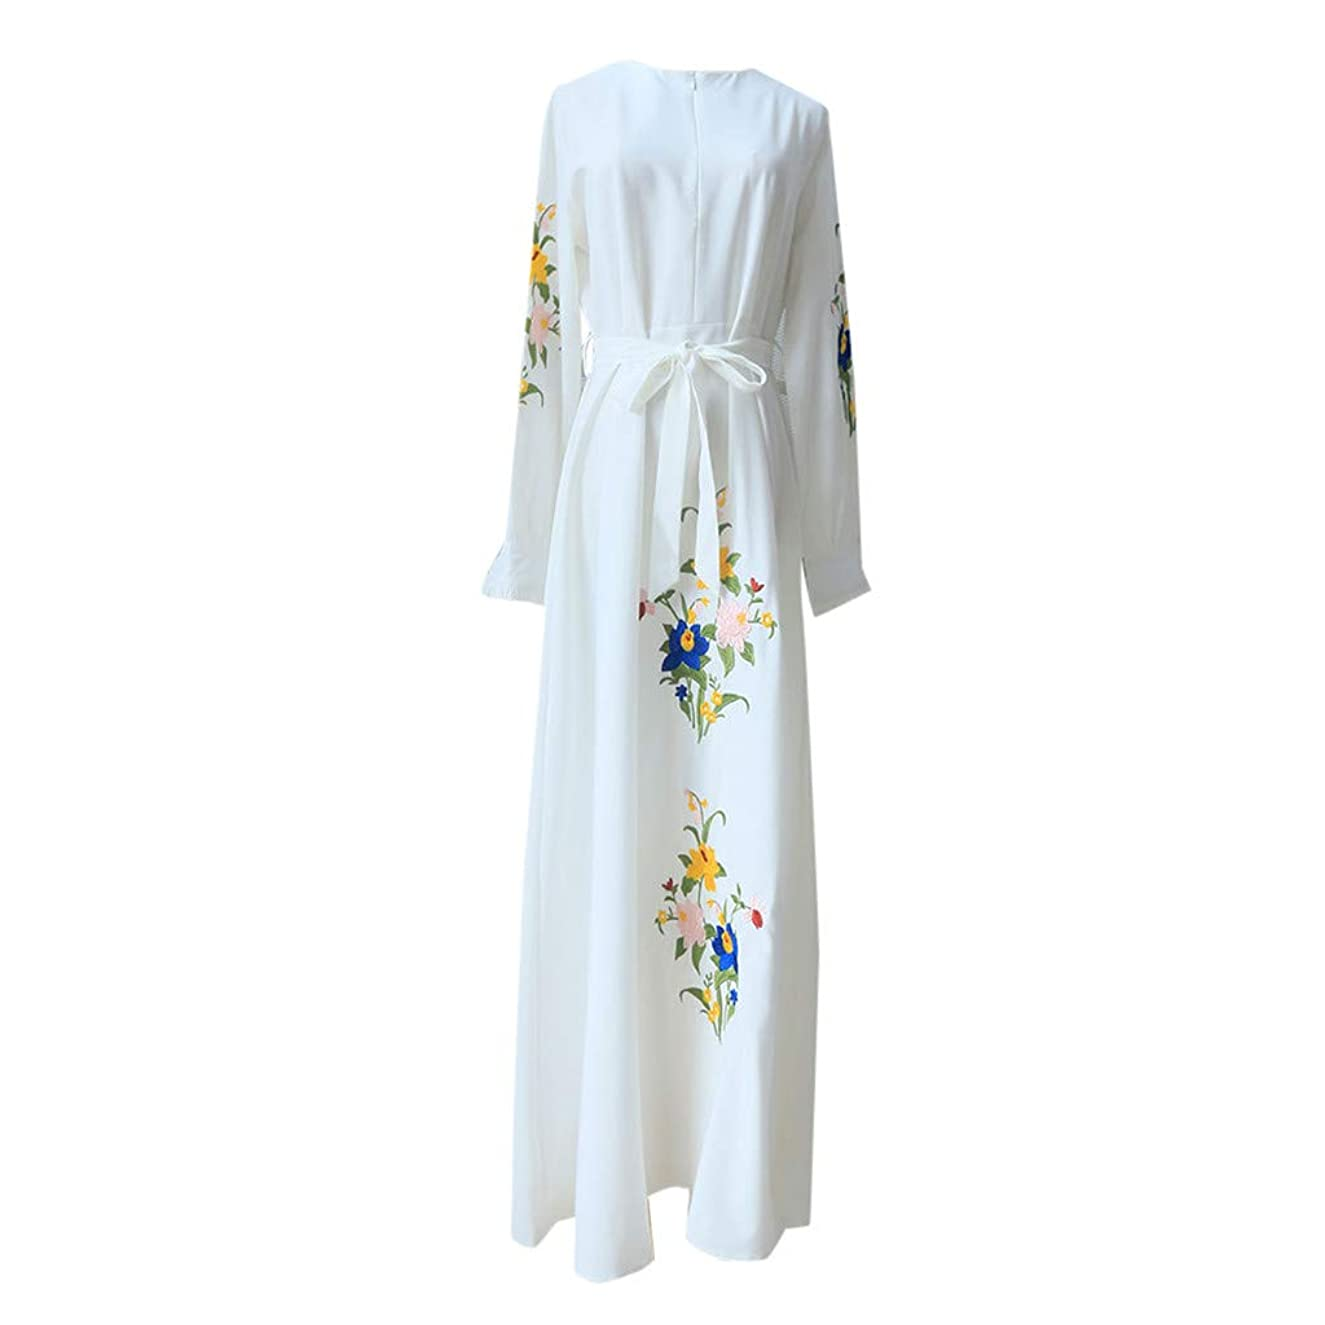 Women Long Maxi Dress Retro Ethnic Style Floral Print Embroidery High Waist High Low Hem Pleated Slim Fit Flowy Swing Dress (XXL, White)